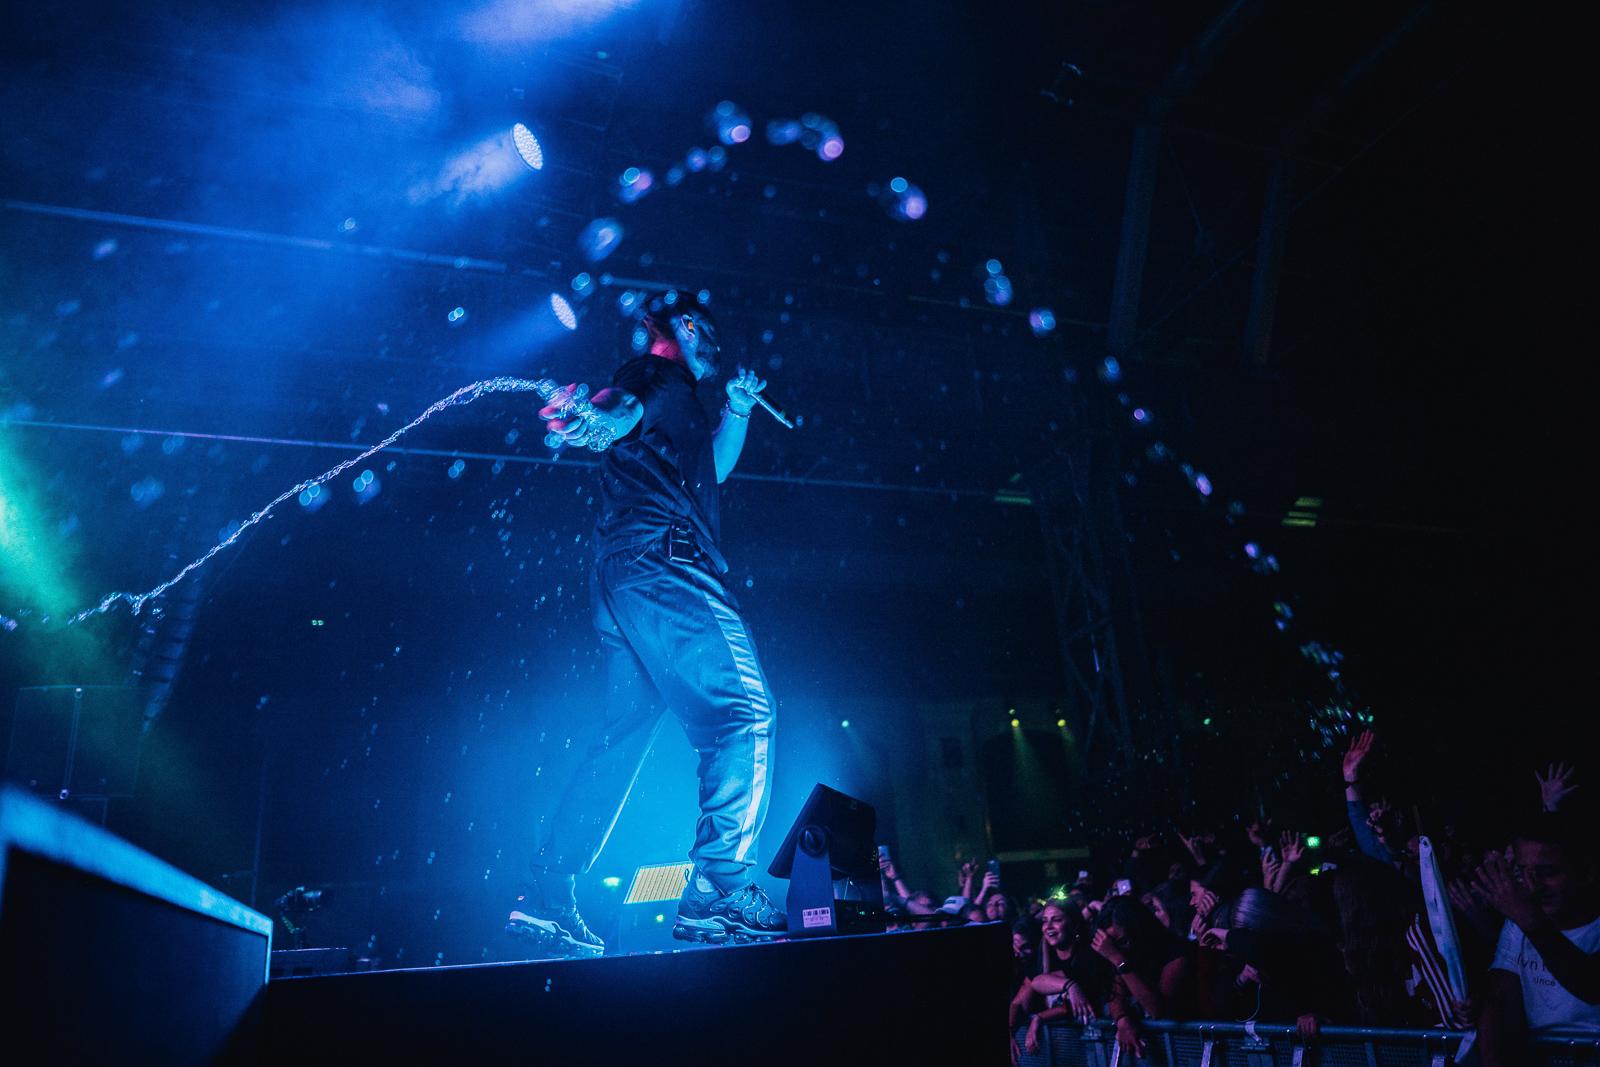 2019_RebeccaRuetten_Web_Spotify-22.jpg